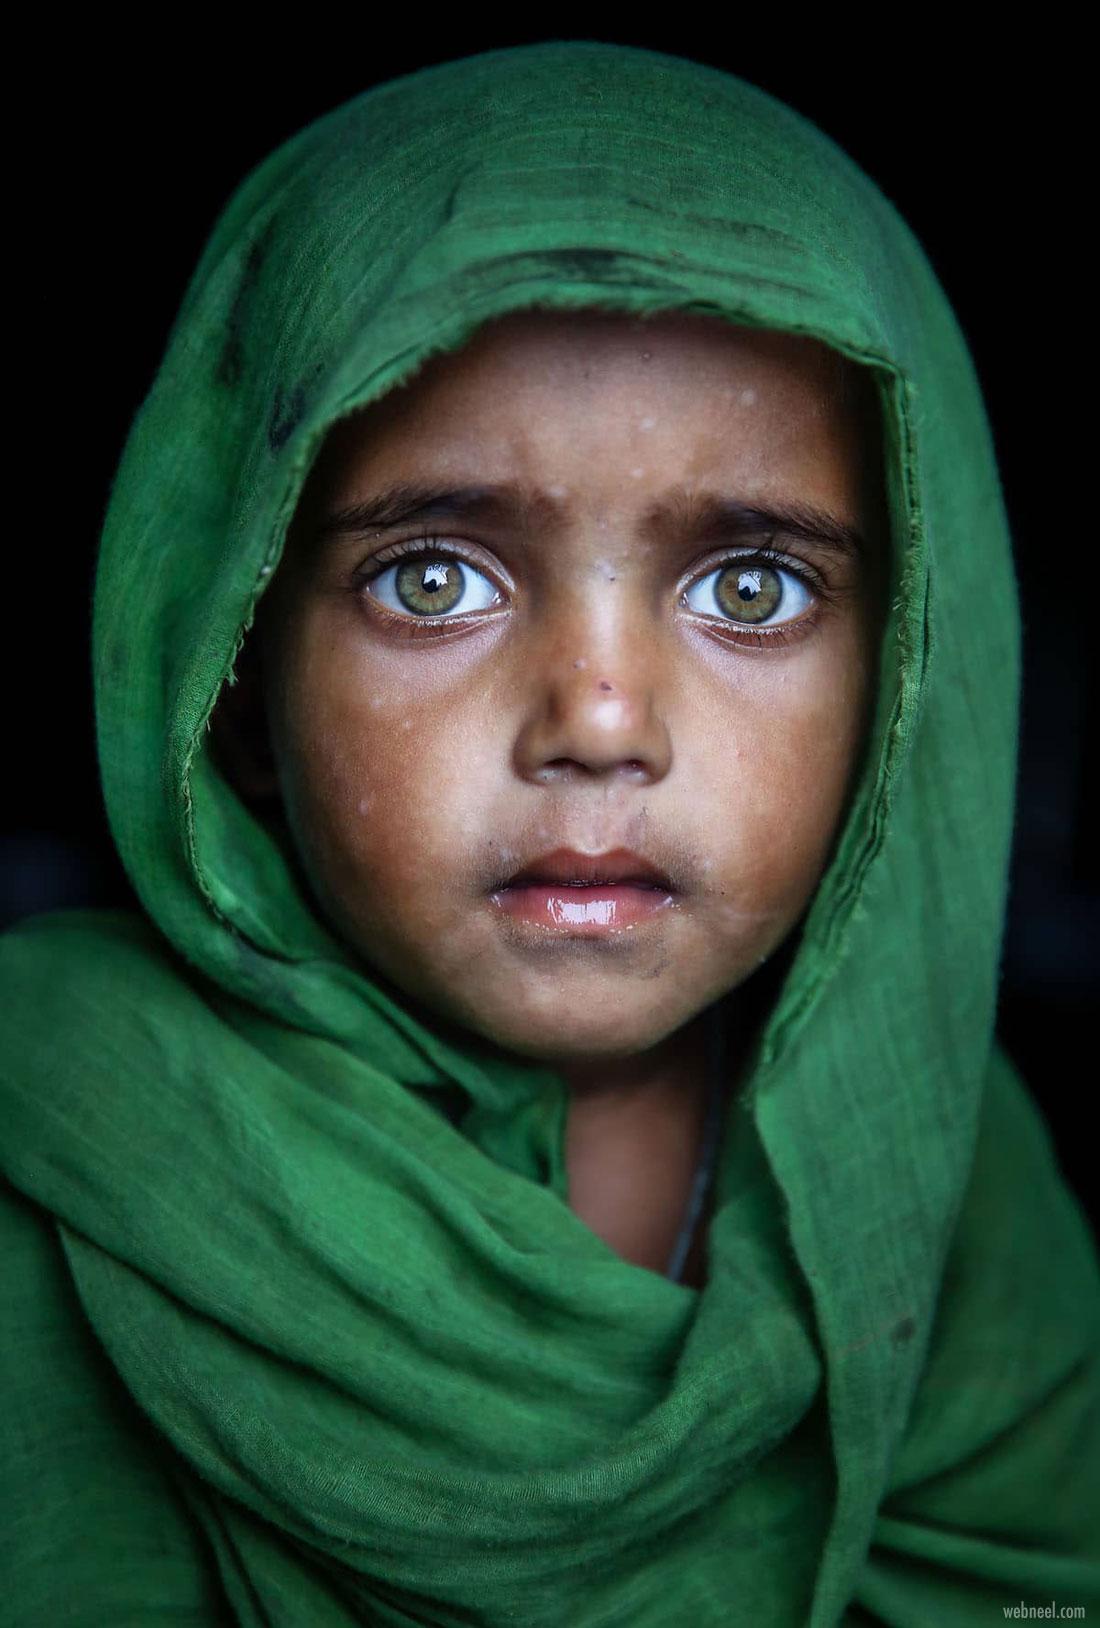 portrait photography bangladeshi girl photographer mou aysha